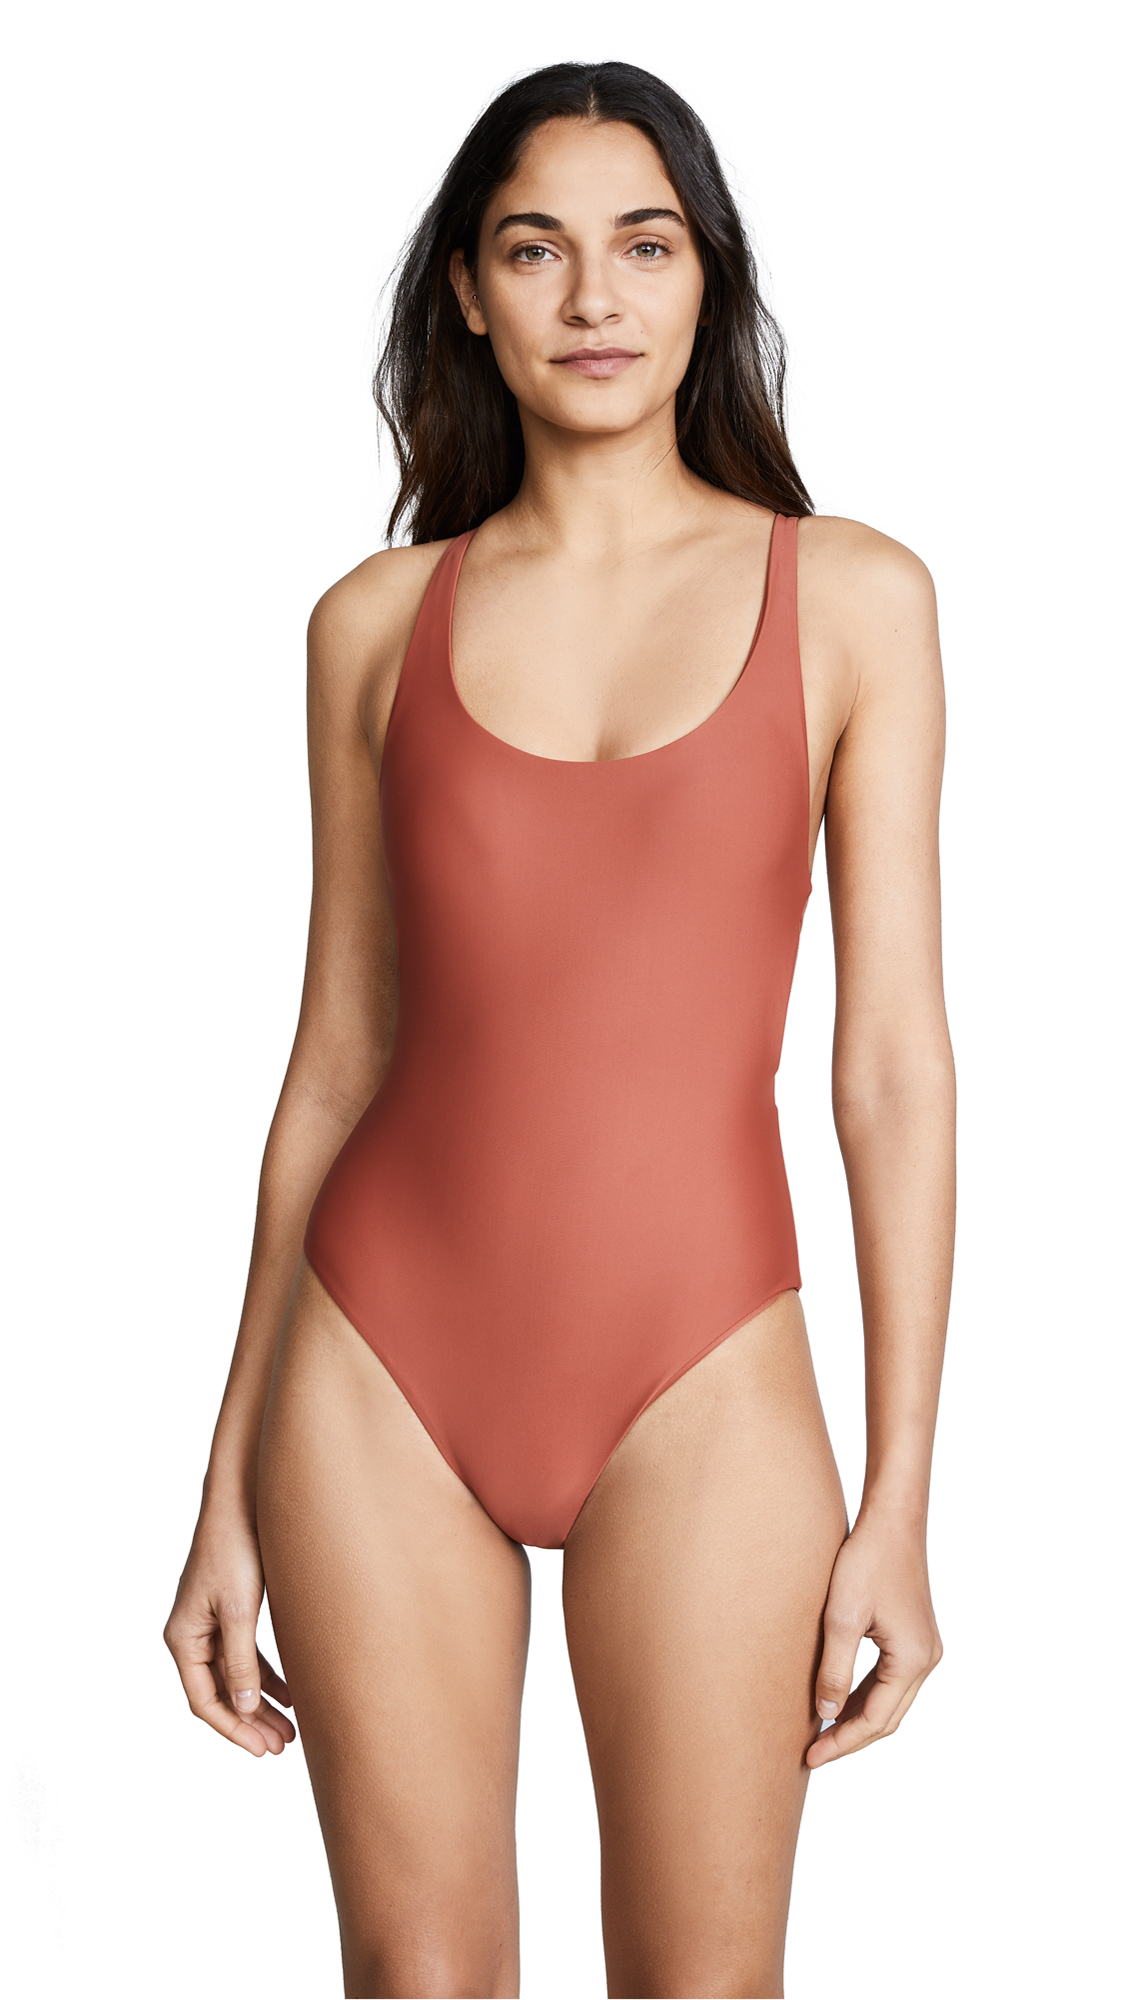 JADE Swim Asterik One Piece Swimsuit